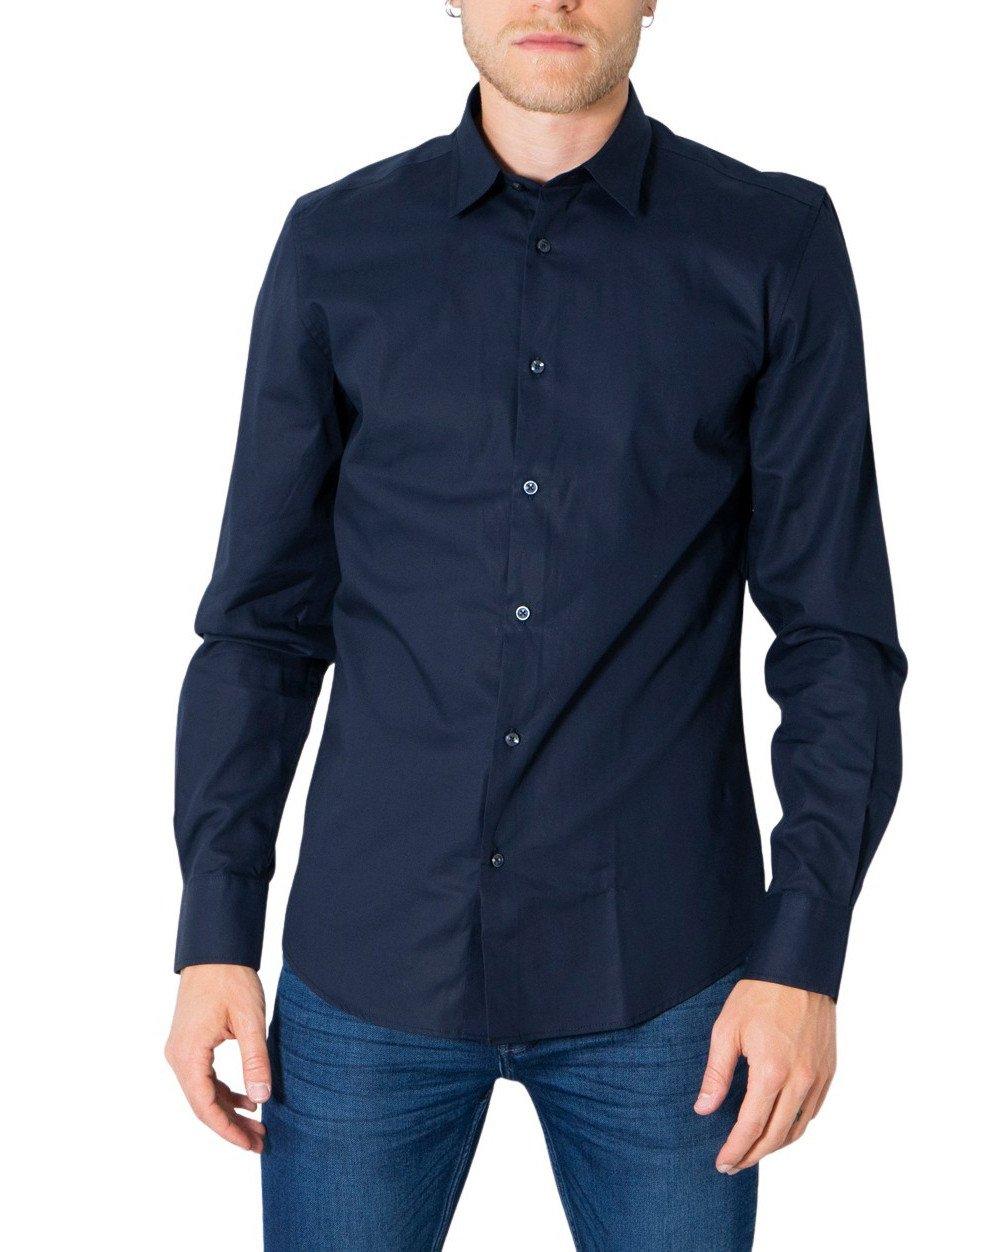 Antony Morato Men's Shirt Various Colours 308289 - blue 44